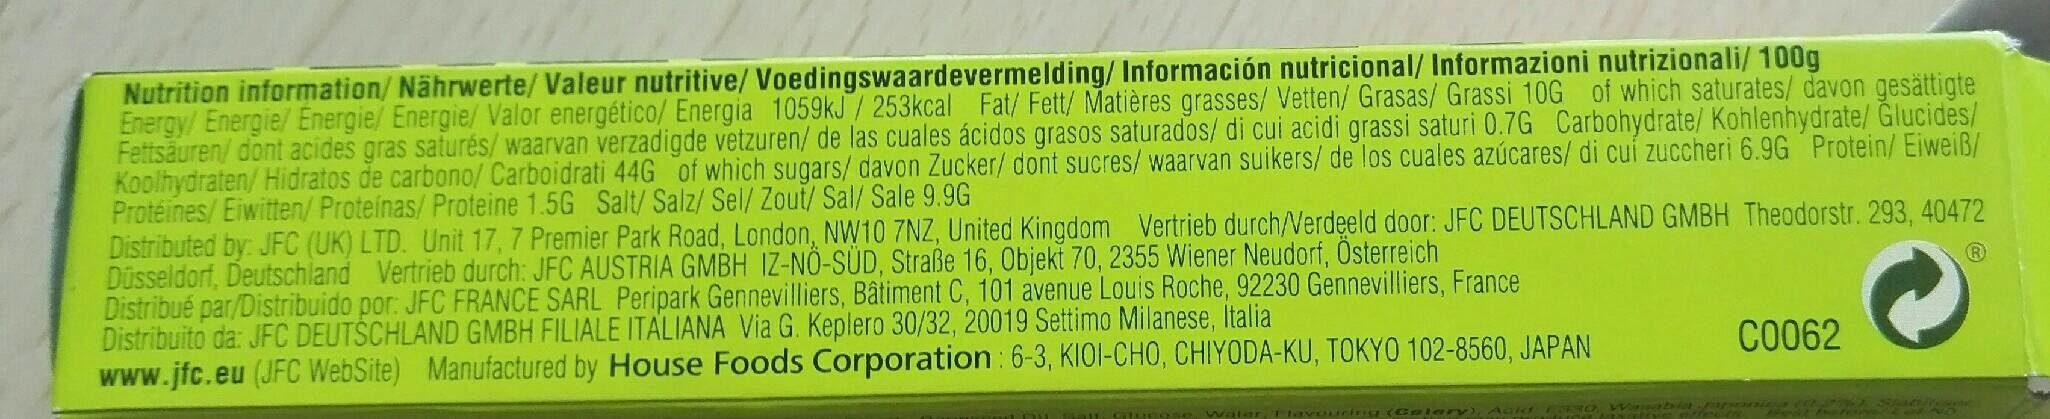 House Foods Wasabi Paste - Informations nutritionnelles - fr